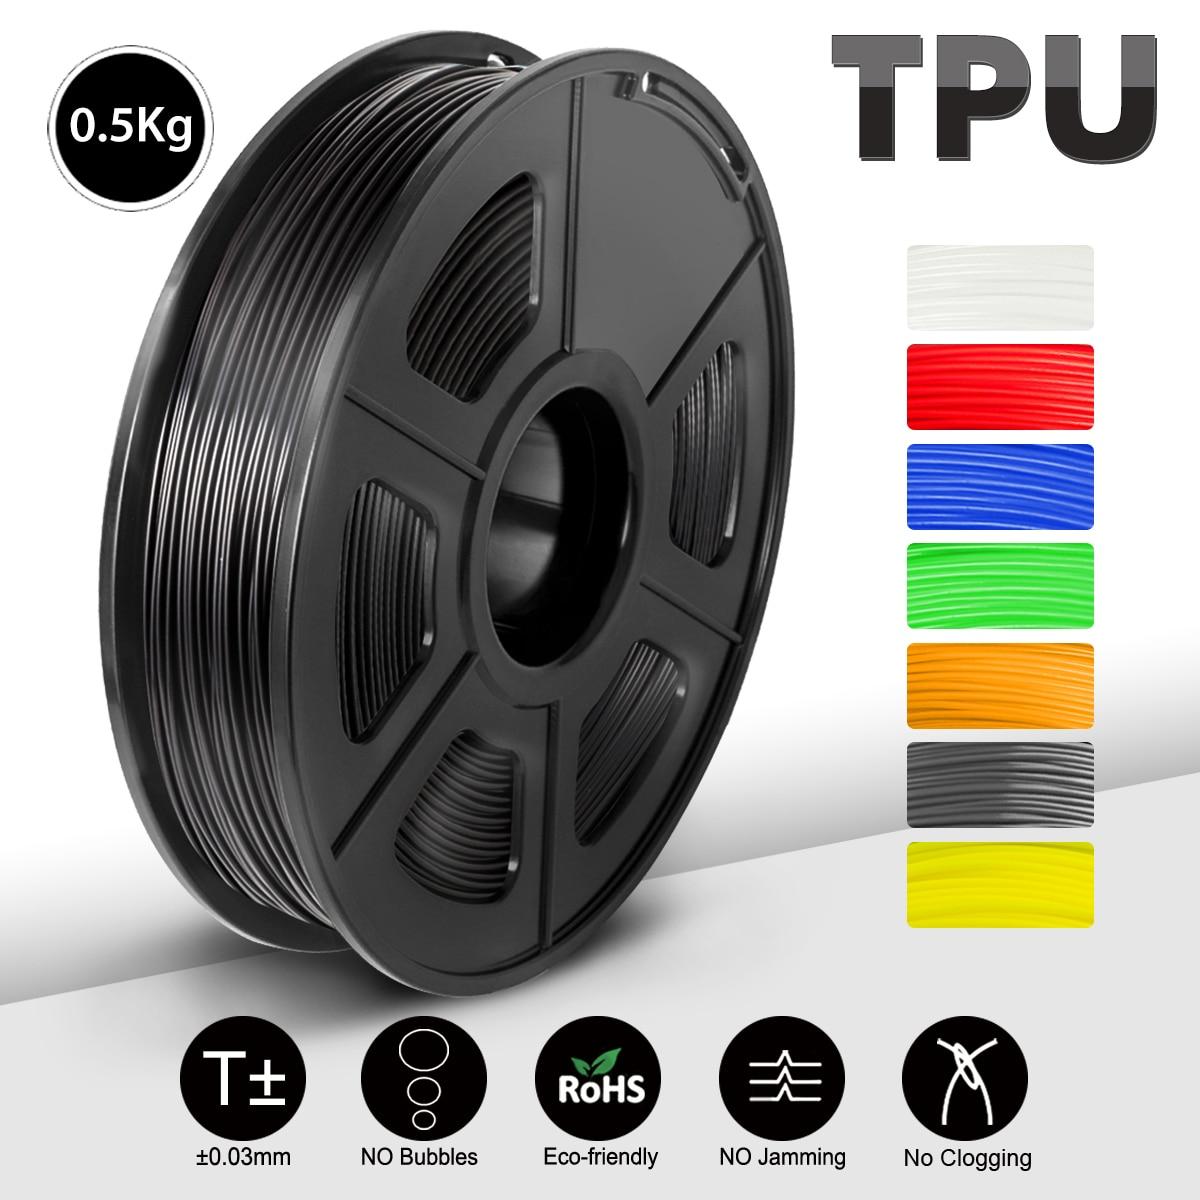 SUNLU 3D הדפסת נימה שחור גמיש TPU נימה 1.75mm 0.5kg(1.1LB) ממדי דיוק +/- 0.02 MM החוף 95A